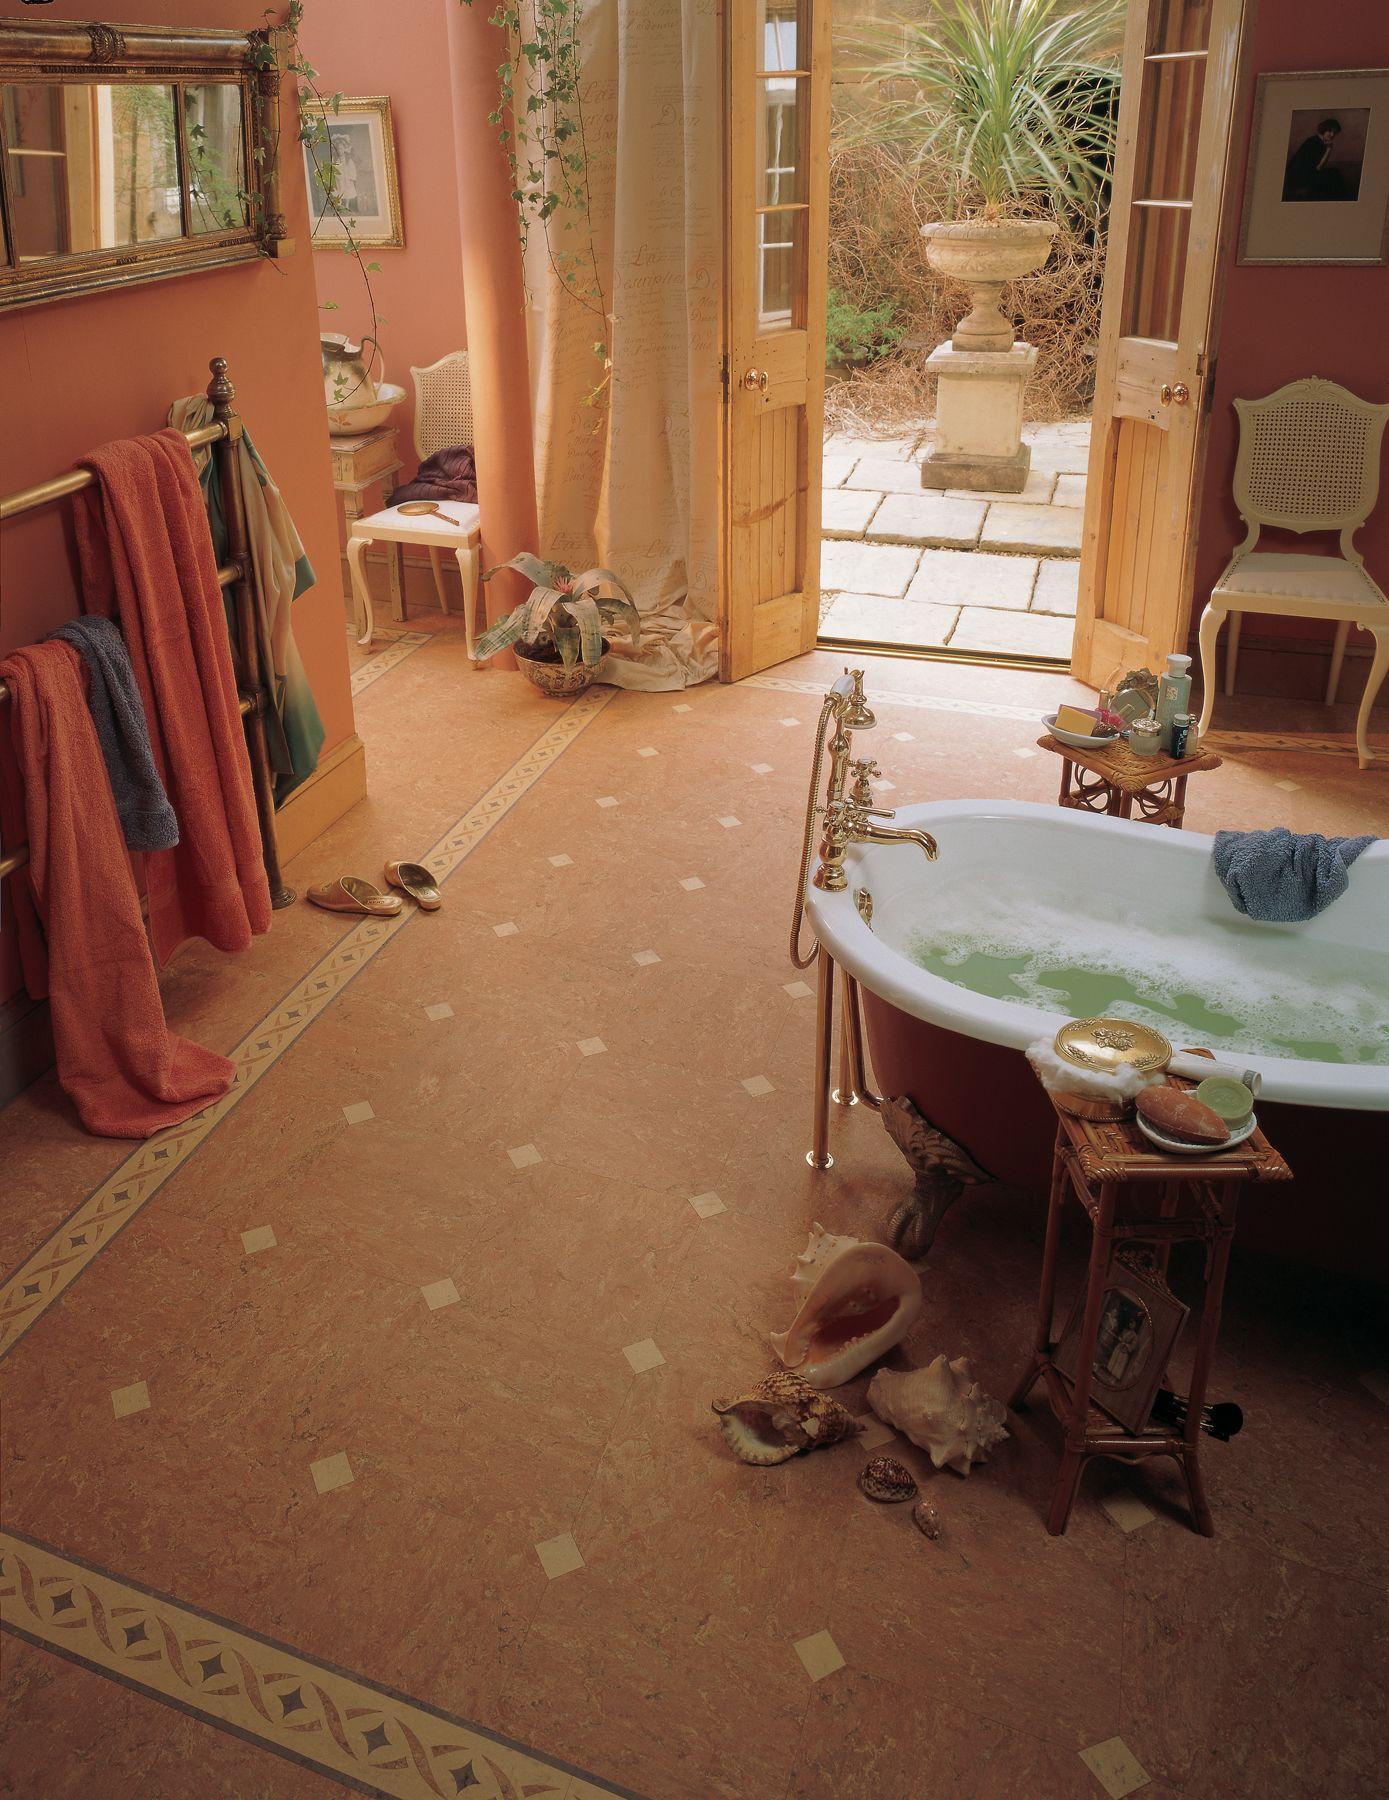 Pin by Lundy Valentine on stuff Bathroom flooring